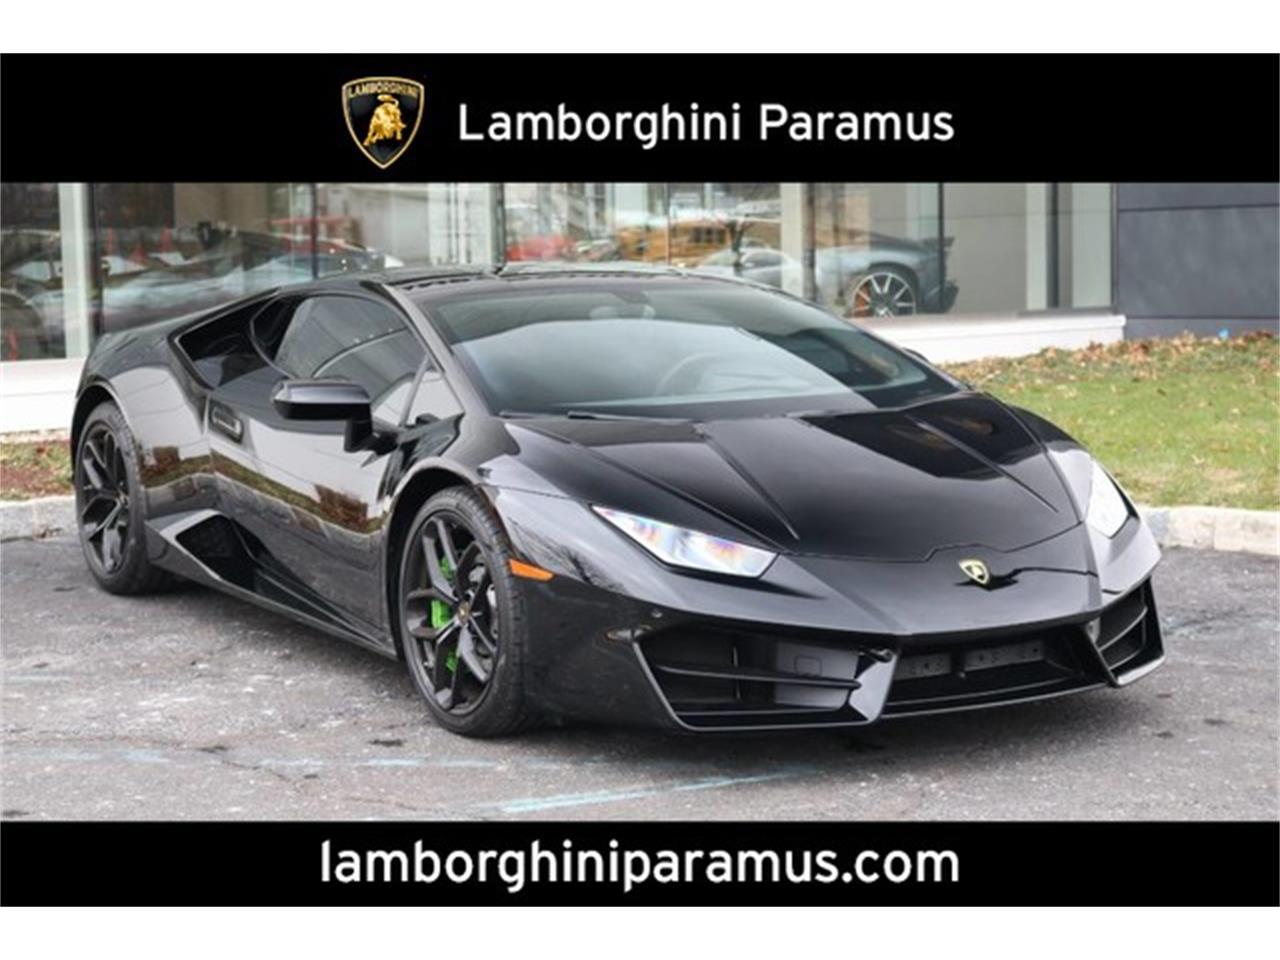 2017 Lamborghini Huracan For Sale Classiccars Com Cc 1052703